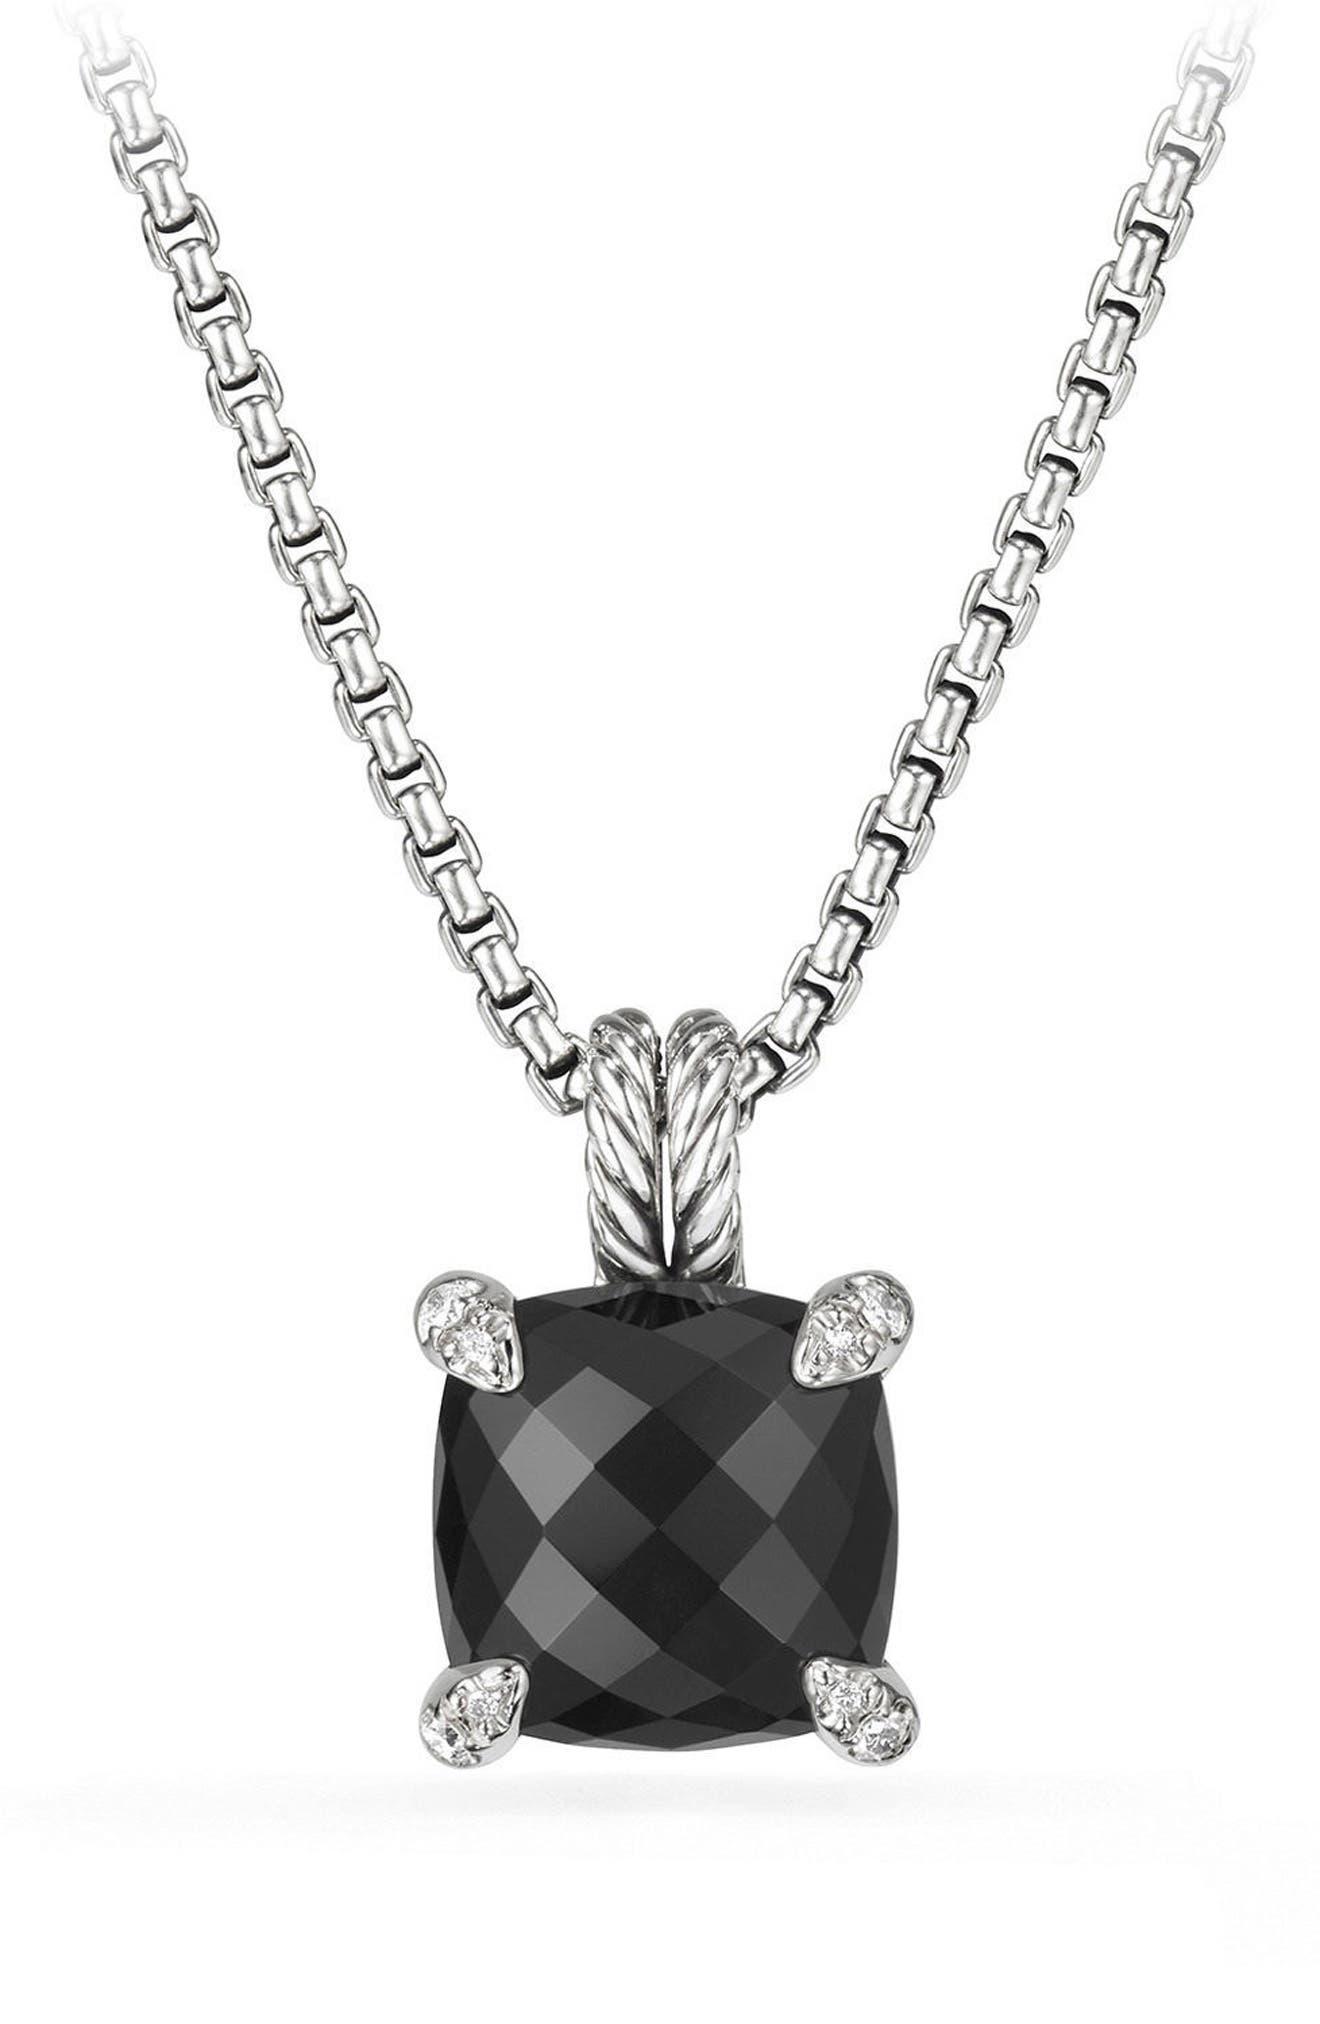 Main Image - David Yurman Châtelaine Pendant Necklace with Black Onyx and Diamonds